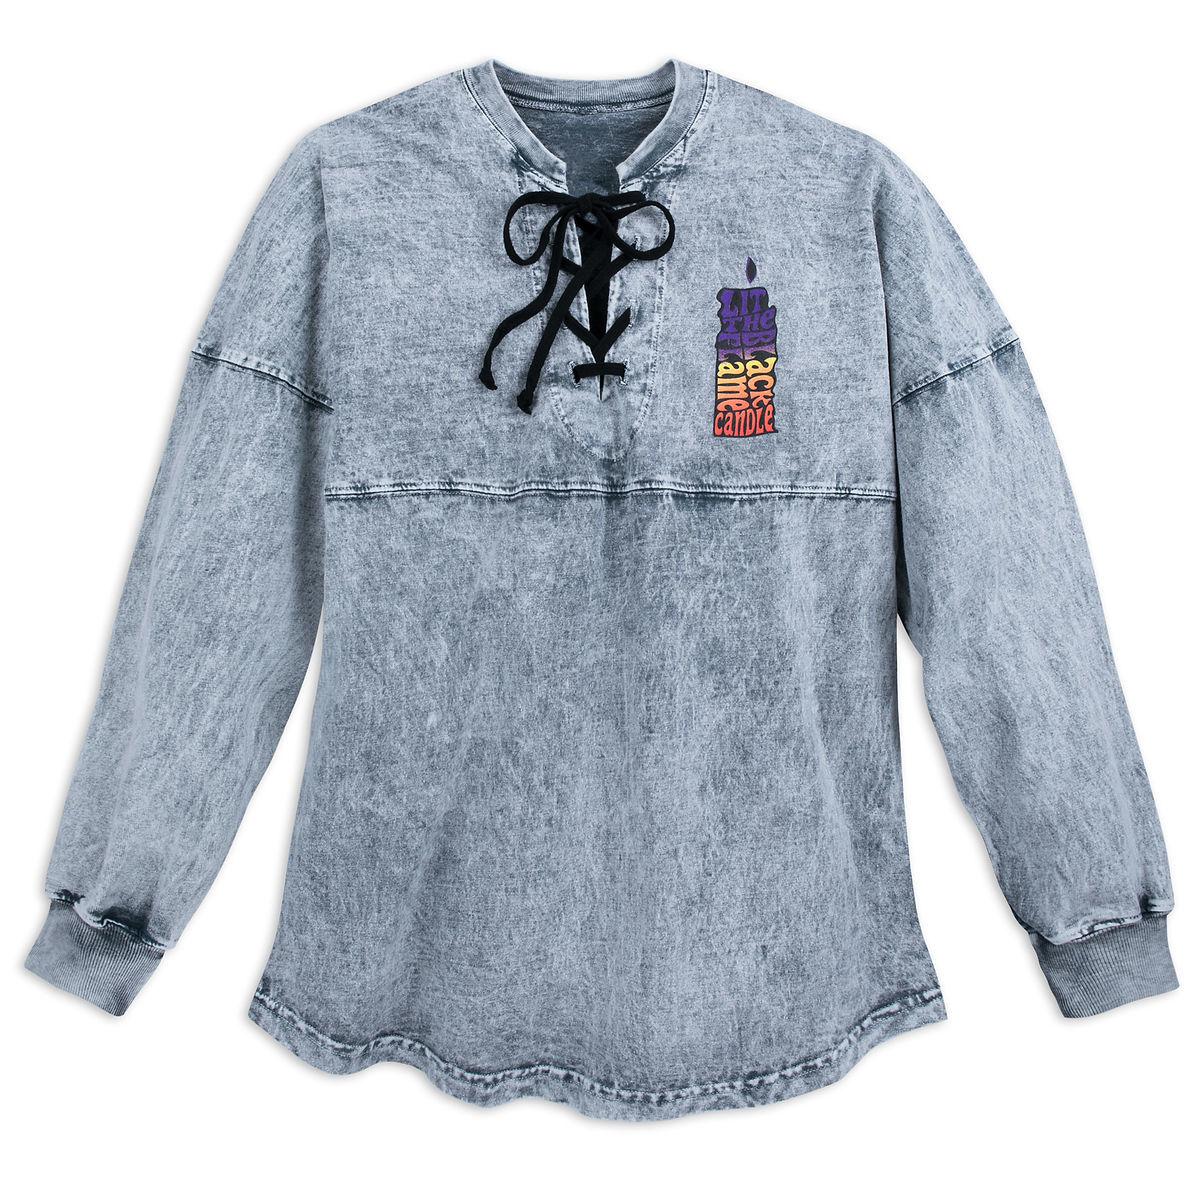 900177144 Product Image of Hocus Pocus Spirit Jersey for Women   1